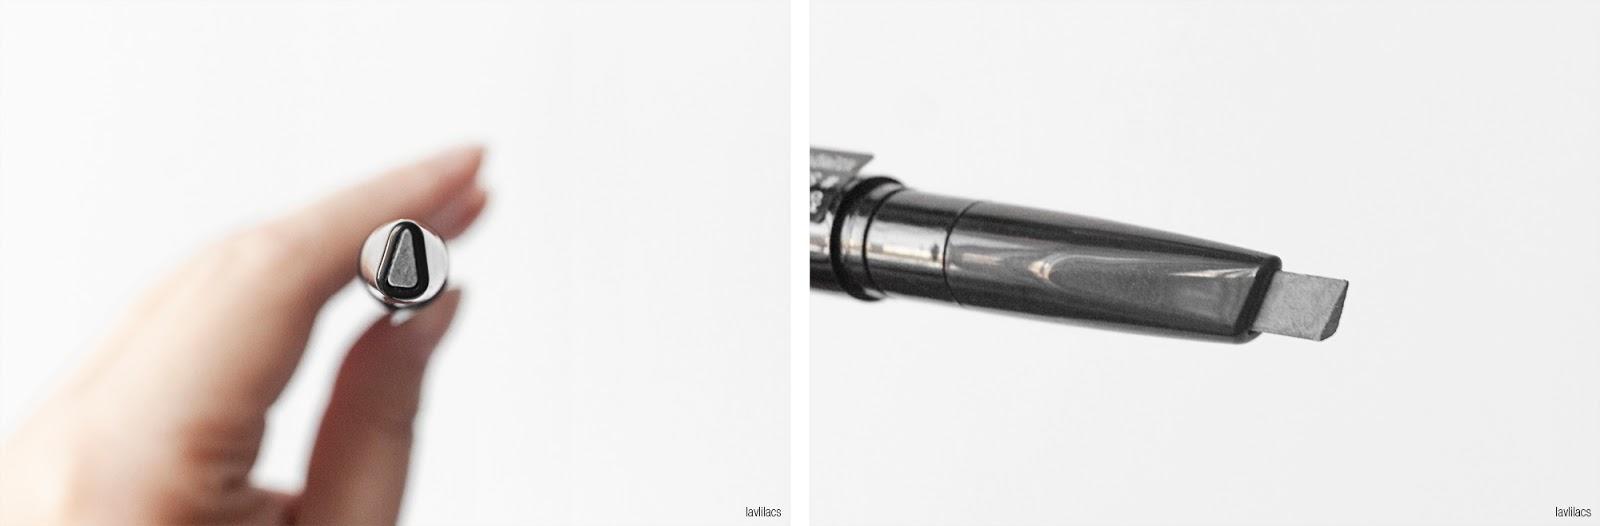 lavlilacs JUNGSAEMMOOL Refining Color-bony Brow - Smoky Bony closeup